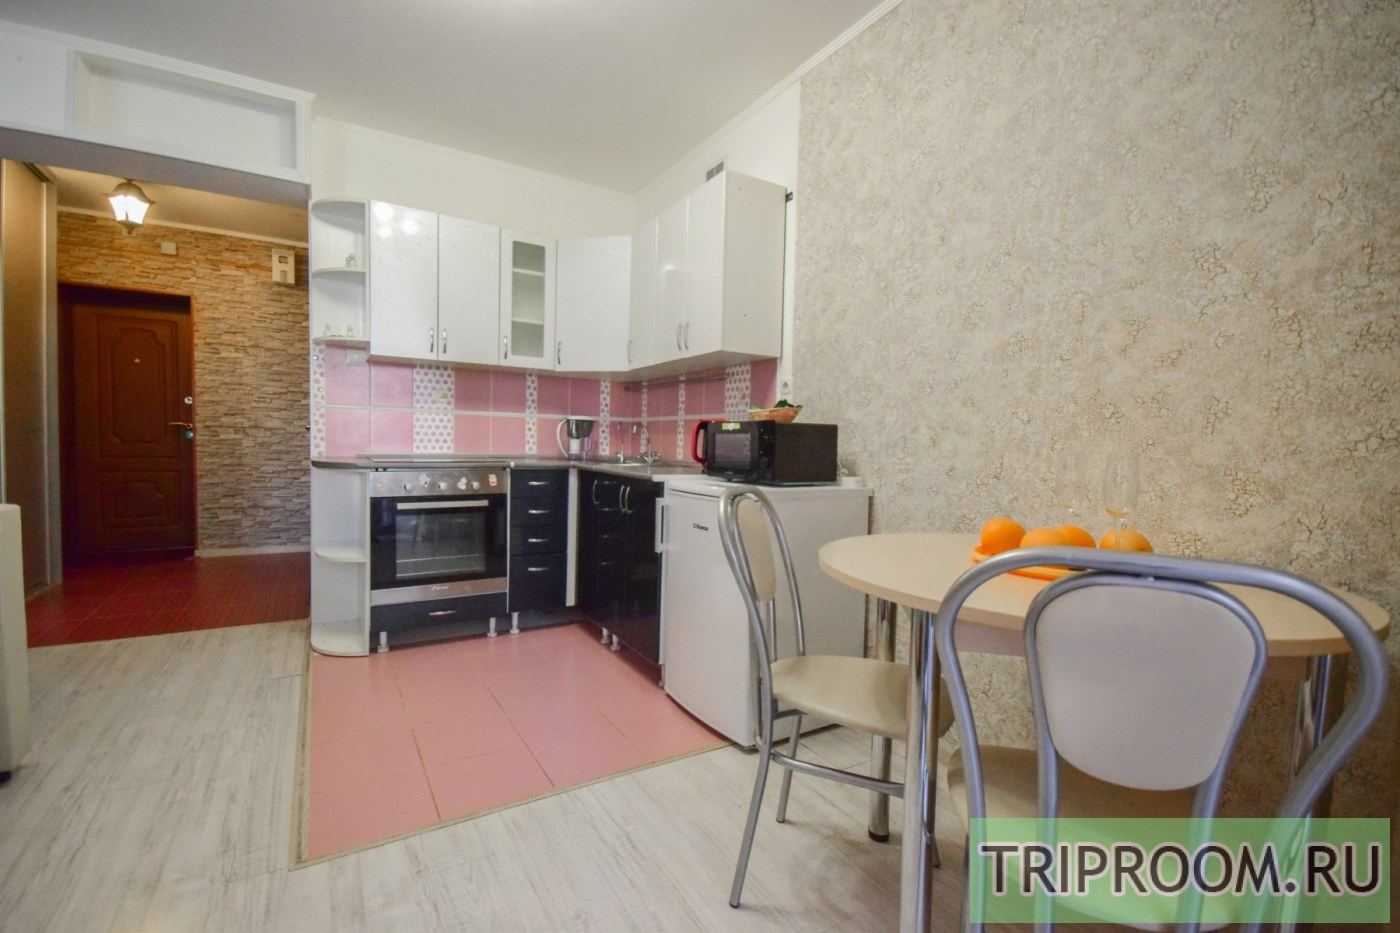 1-комнатная квартира посуточно (вариант № 36547), ул. Тихий переулок, фото № 13